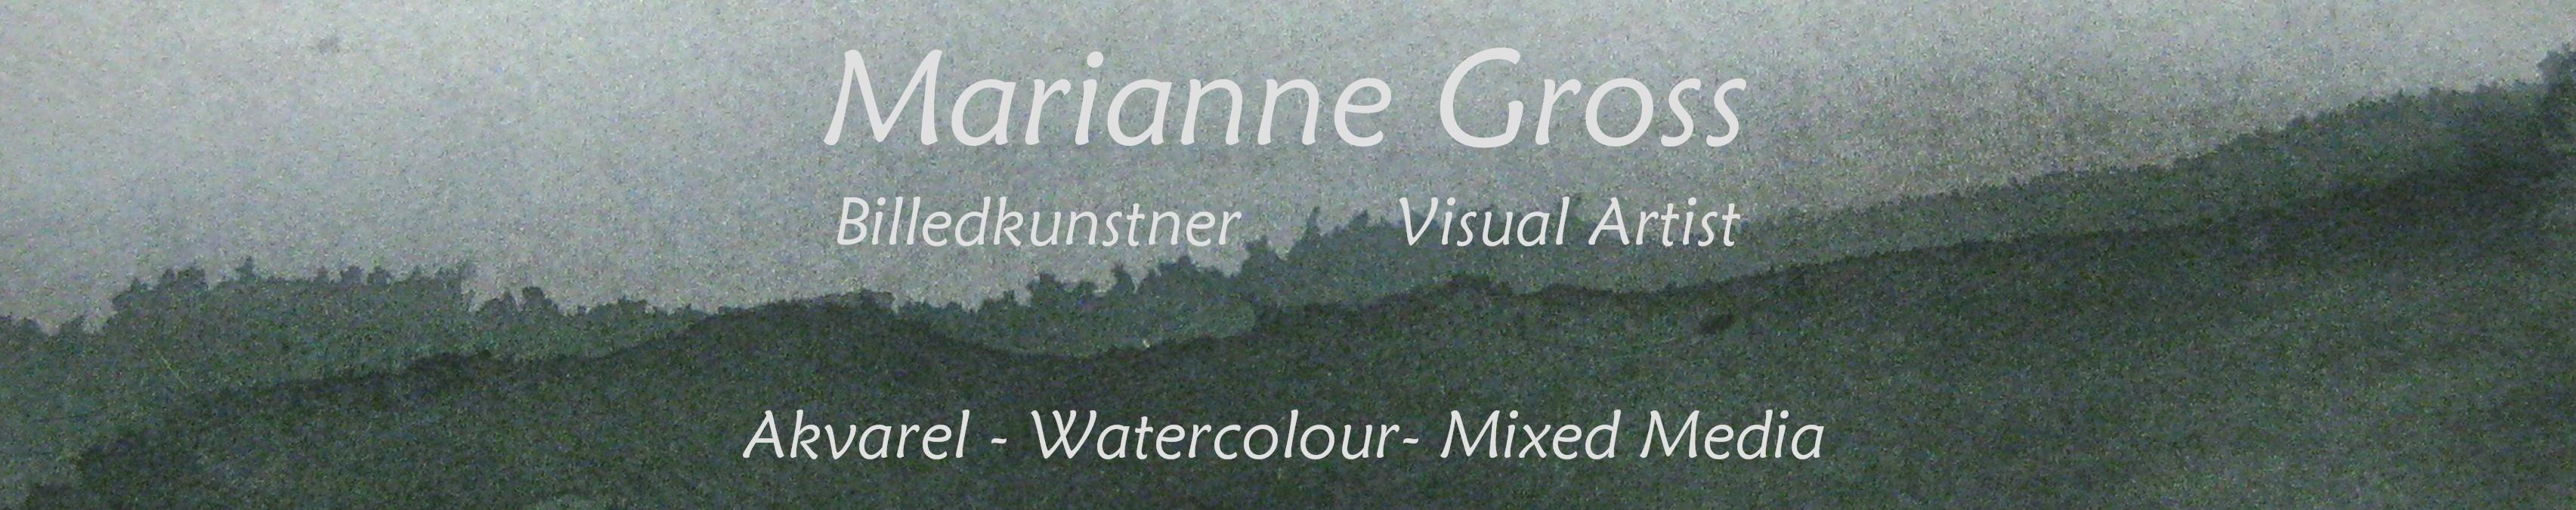 Marianne Gross Logo